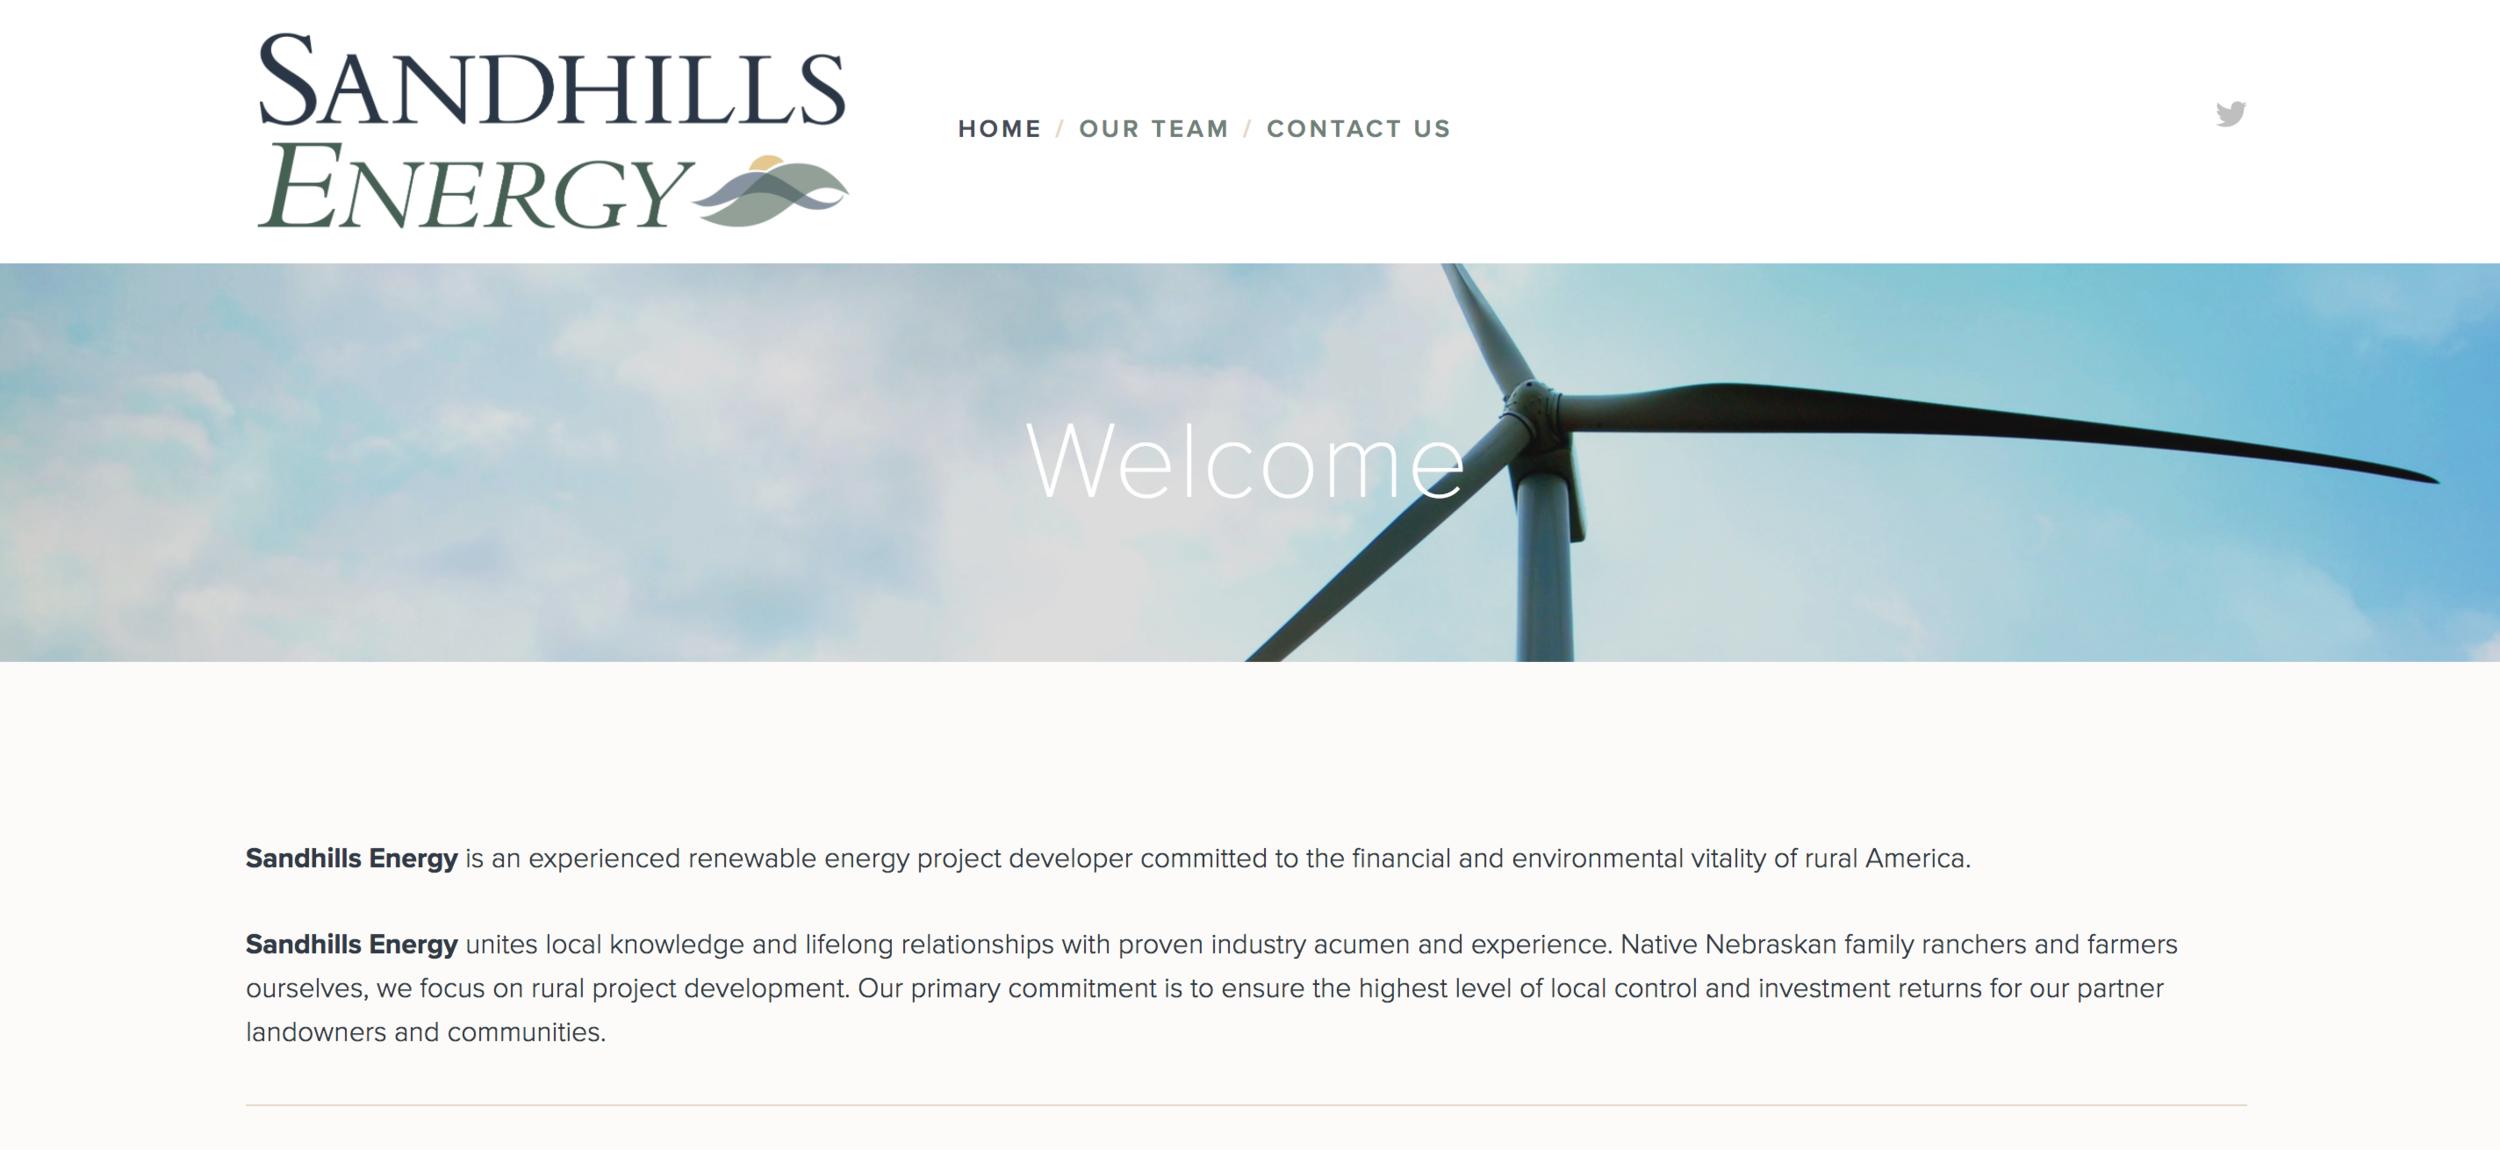 Sandhills Energy